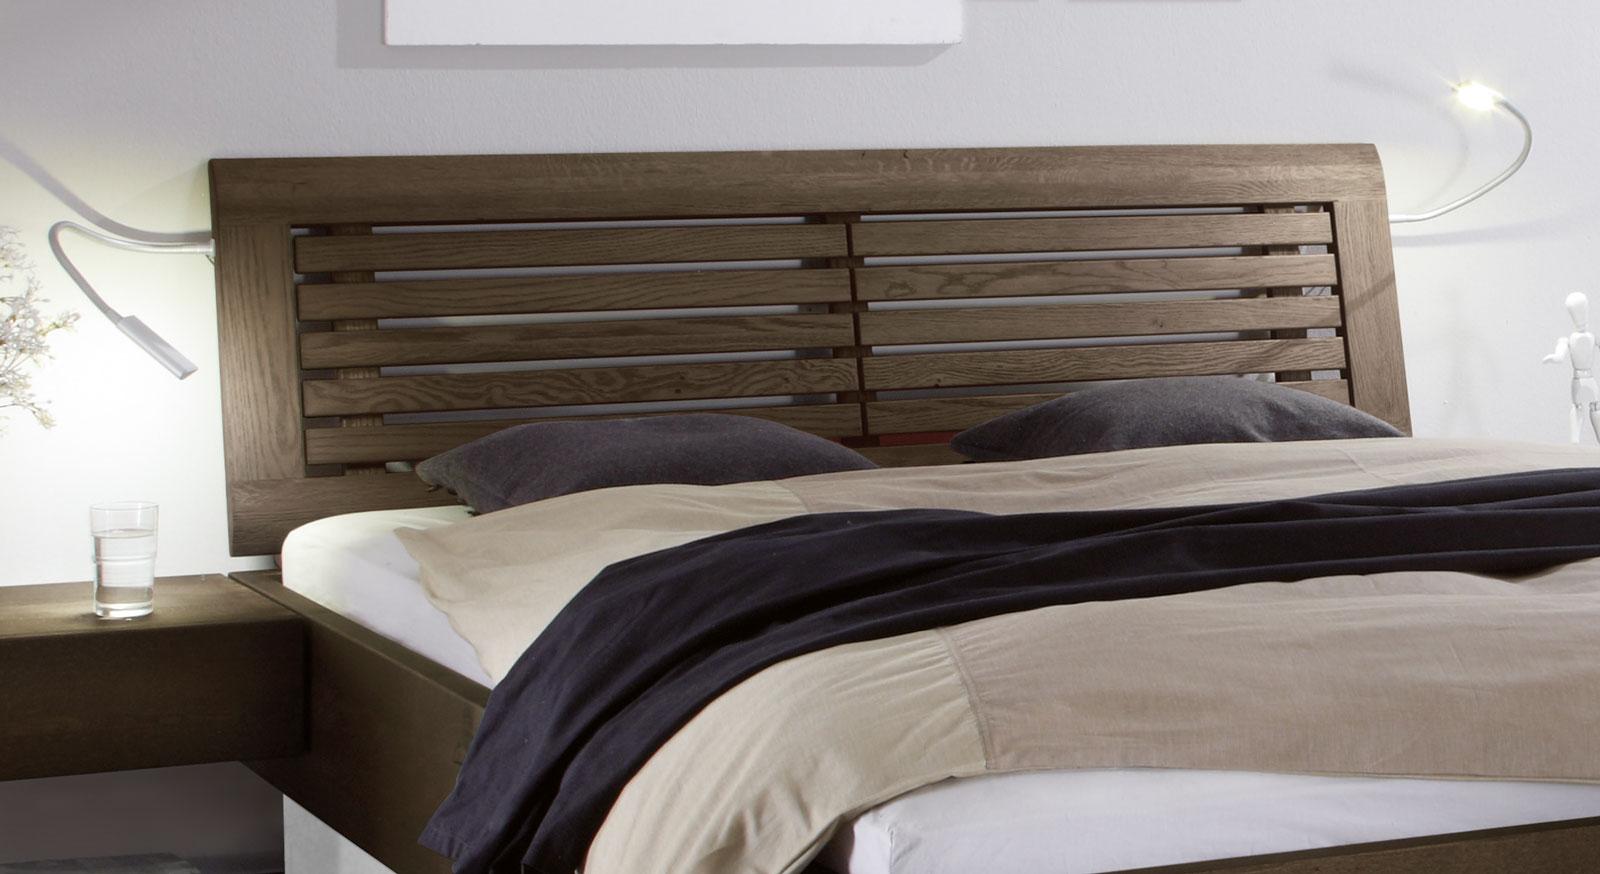 Bett Patea inklusive modernem Sprossenkopfteil